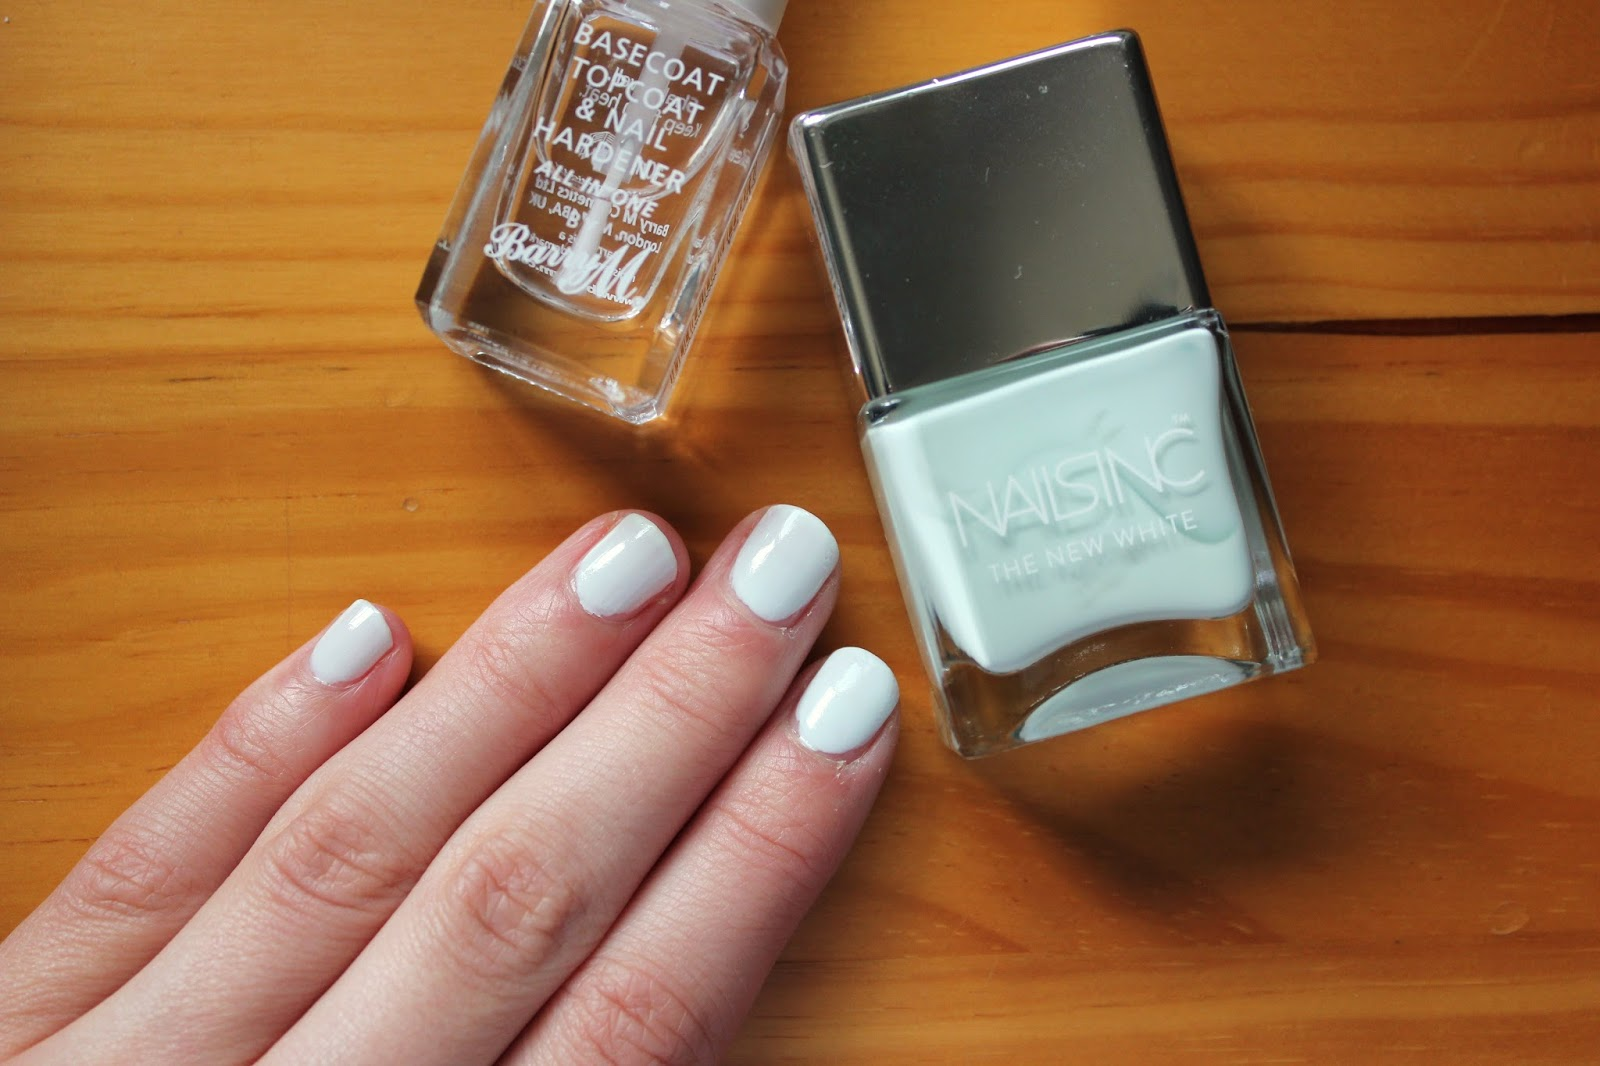 georgie-minter-brown-georgina-frequencies-blogger-beauty-nails-nail-polish-inc-swan-street-review